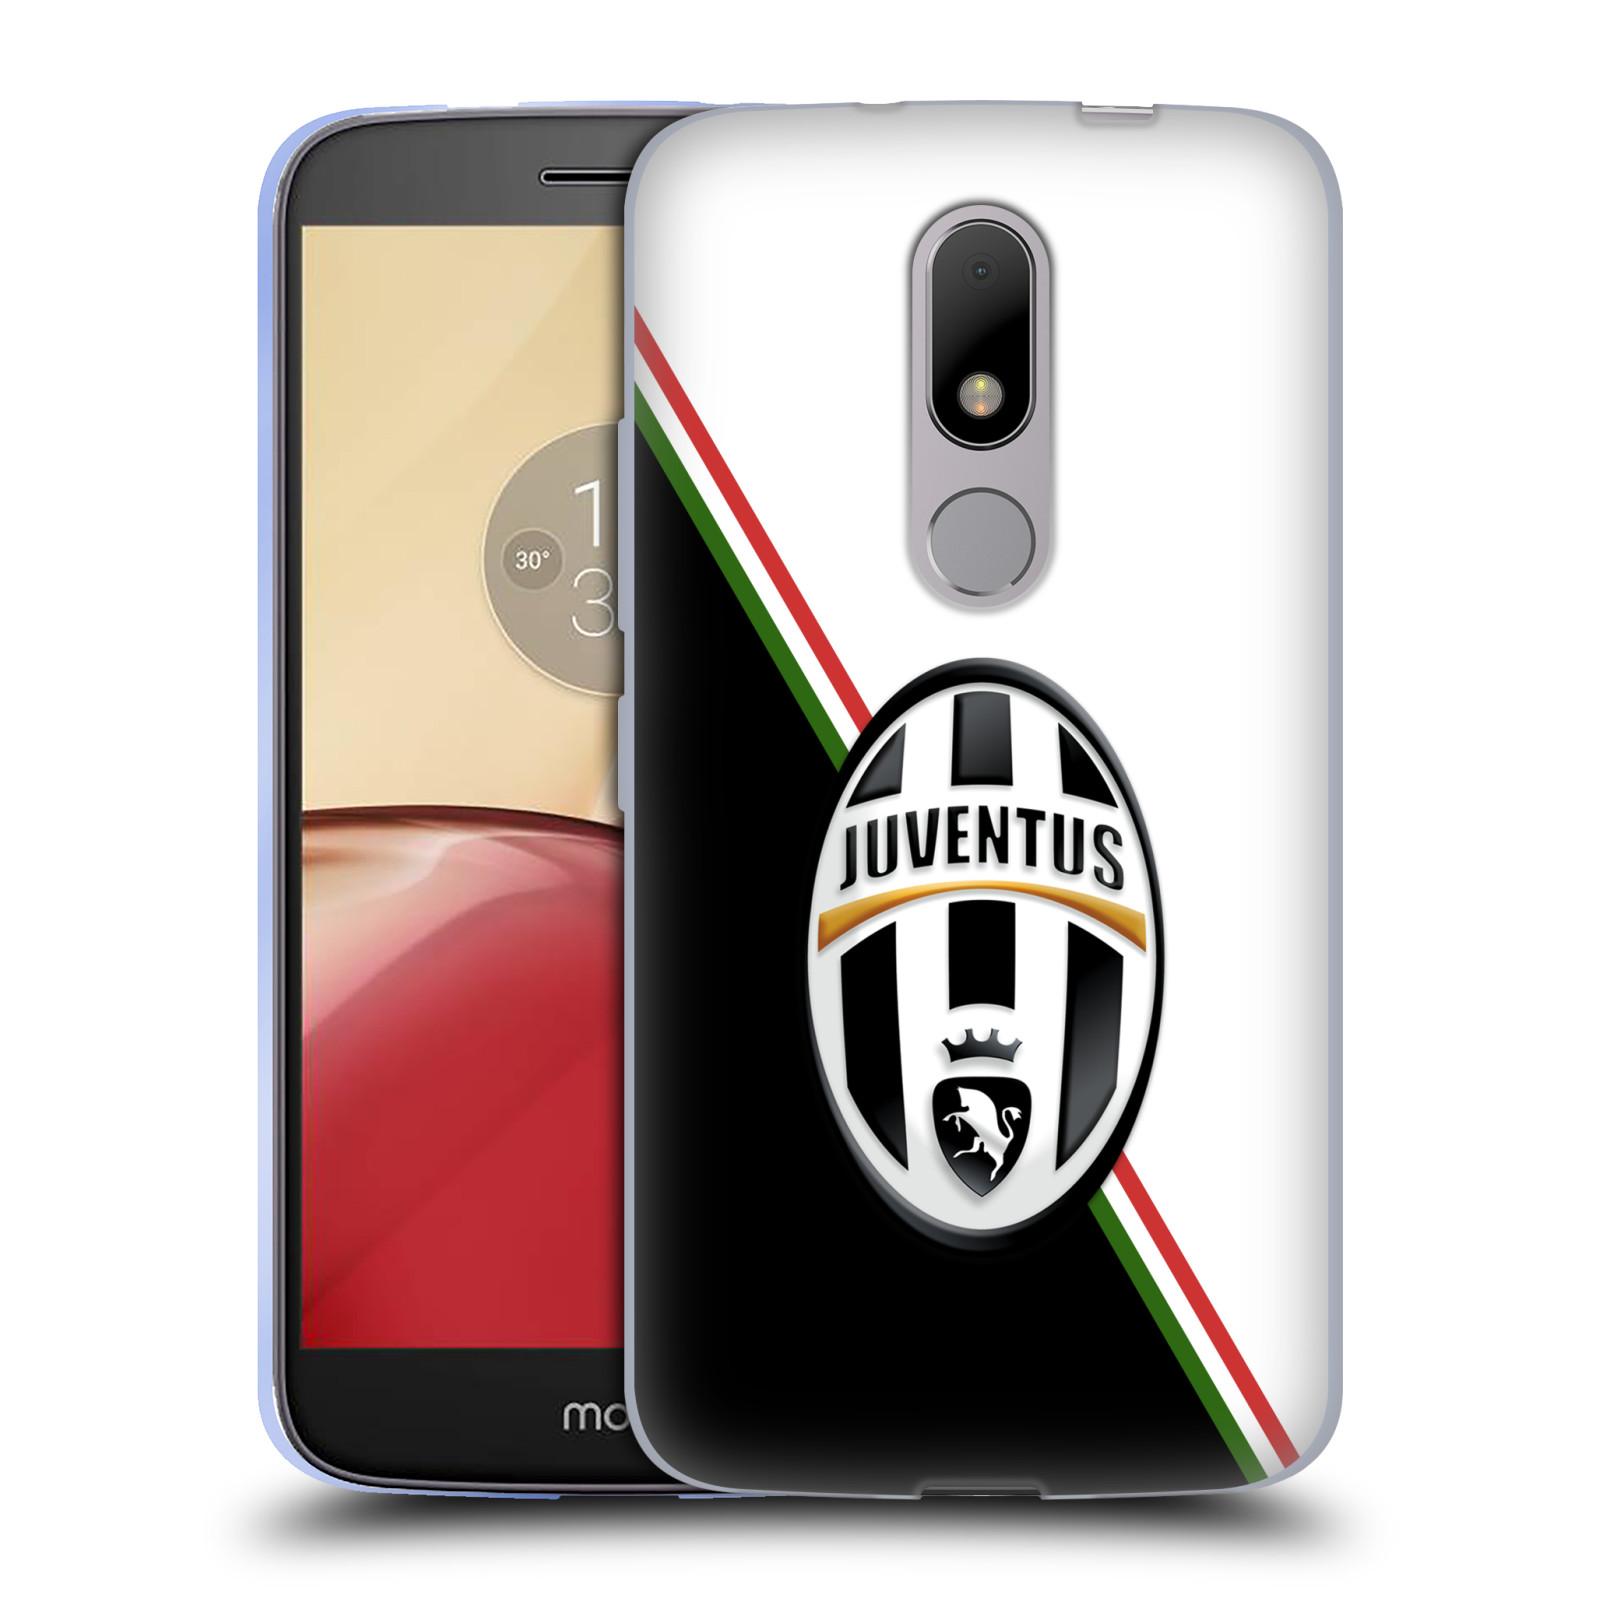 Silikonové pouzdro na mobil Lenovo Moto M - Head Case Juventus FC - Black and White (Silikonový kryt či obal na mobilní telefon Juventus FC Official pro Lenovo Moto M (Dual Sim))